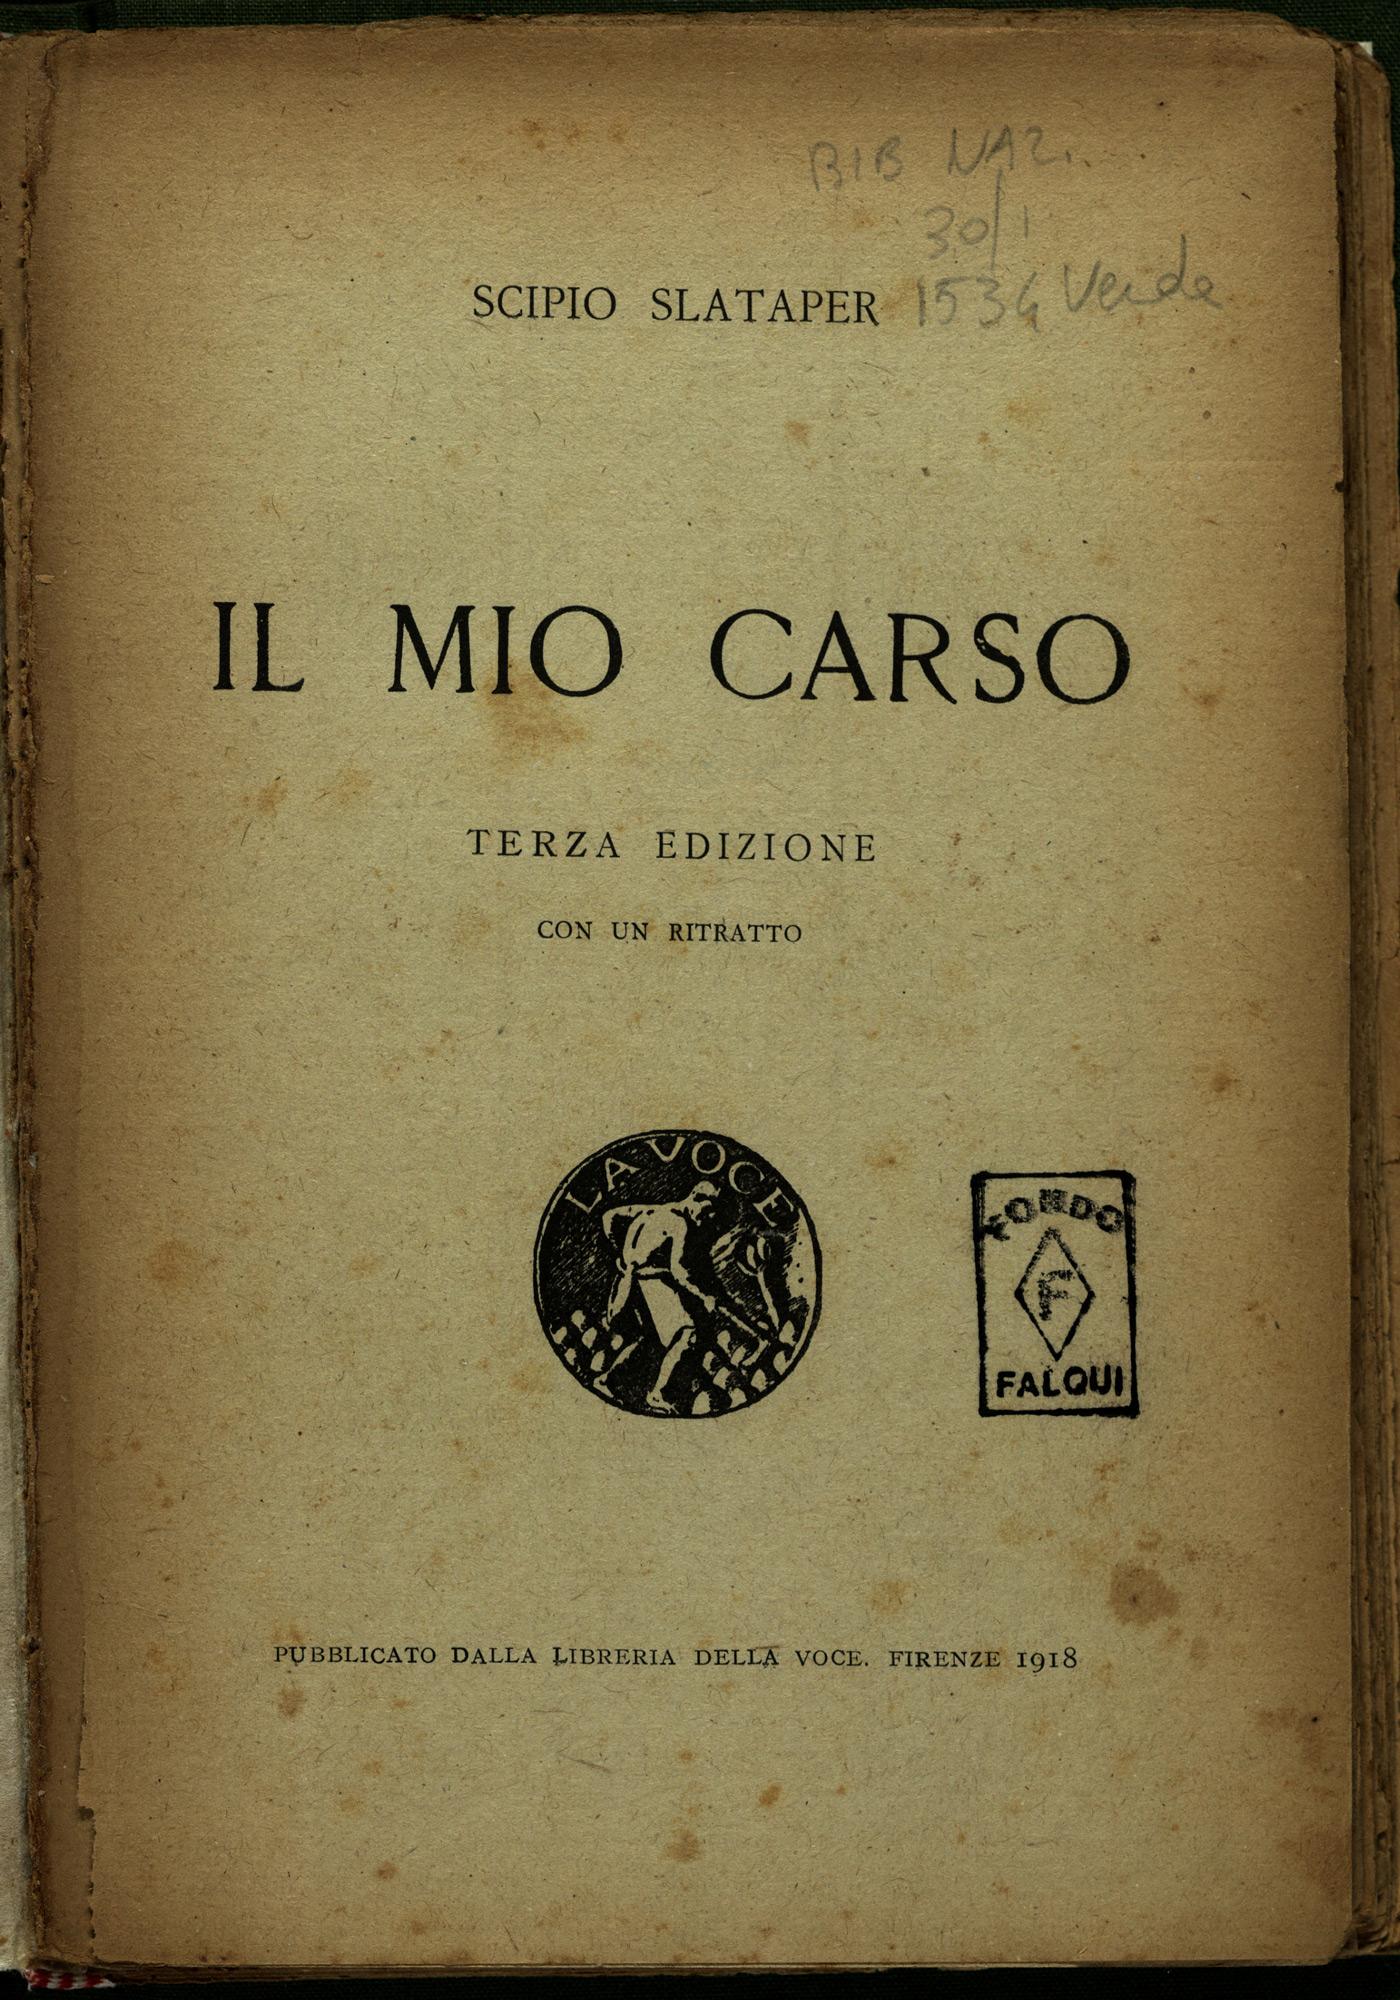 My Carso